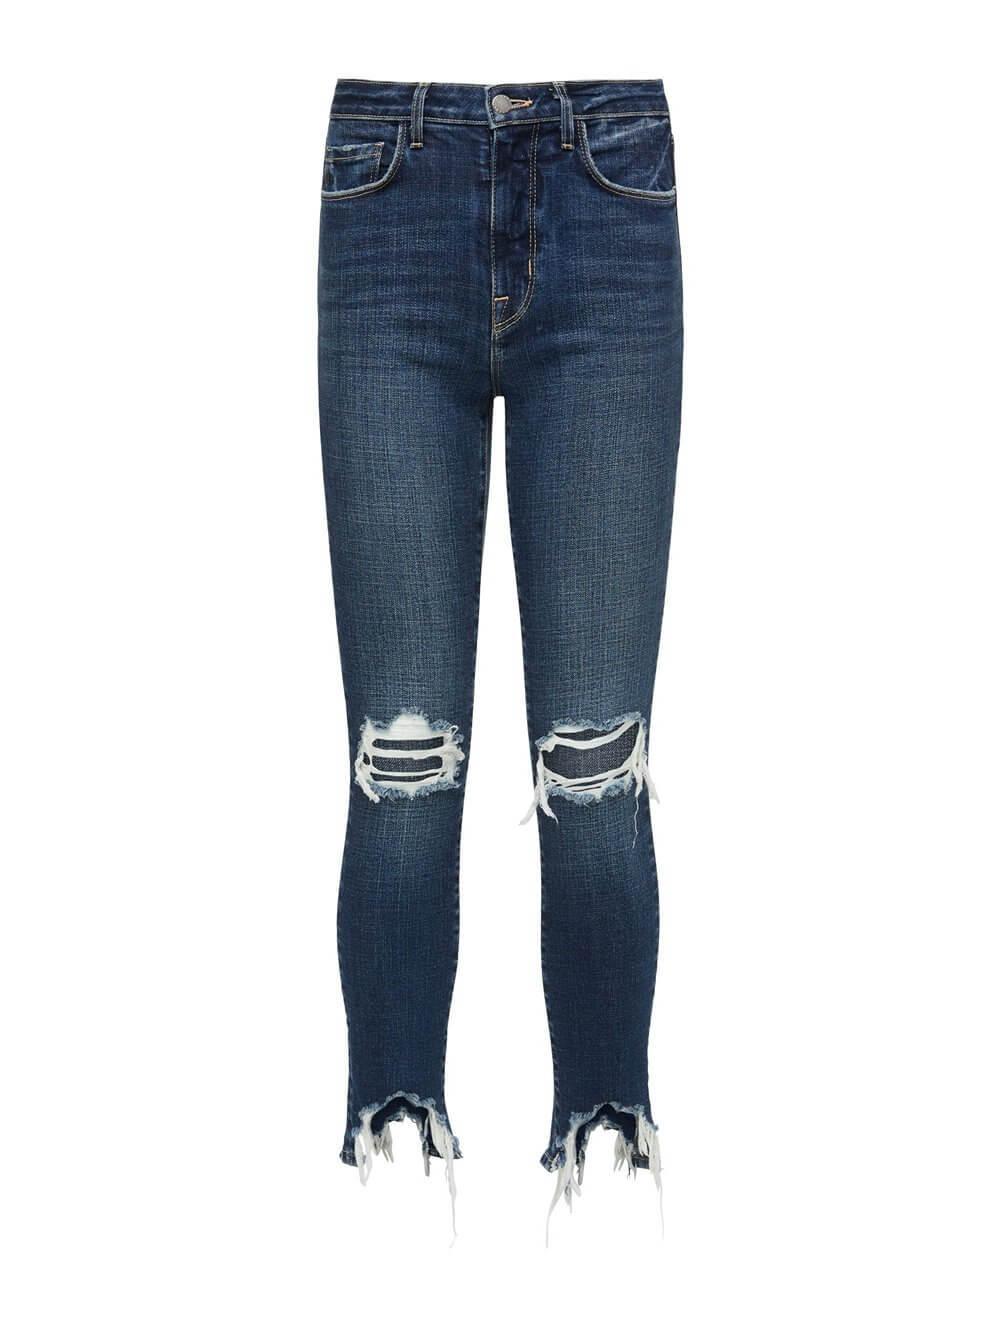 High Line Skinny Jean Item # 2619HZND